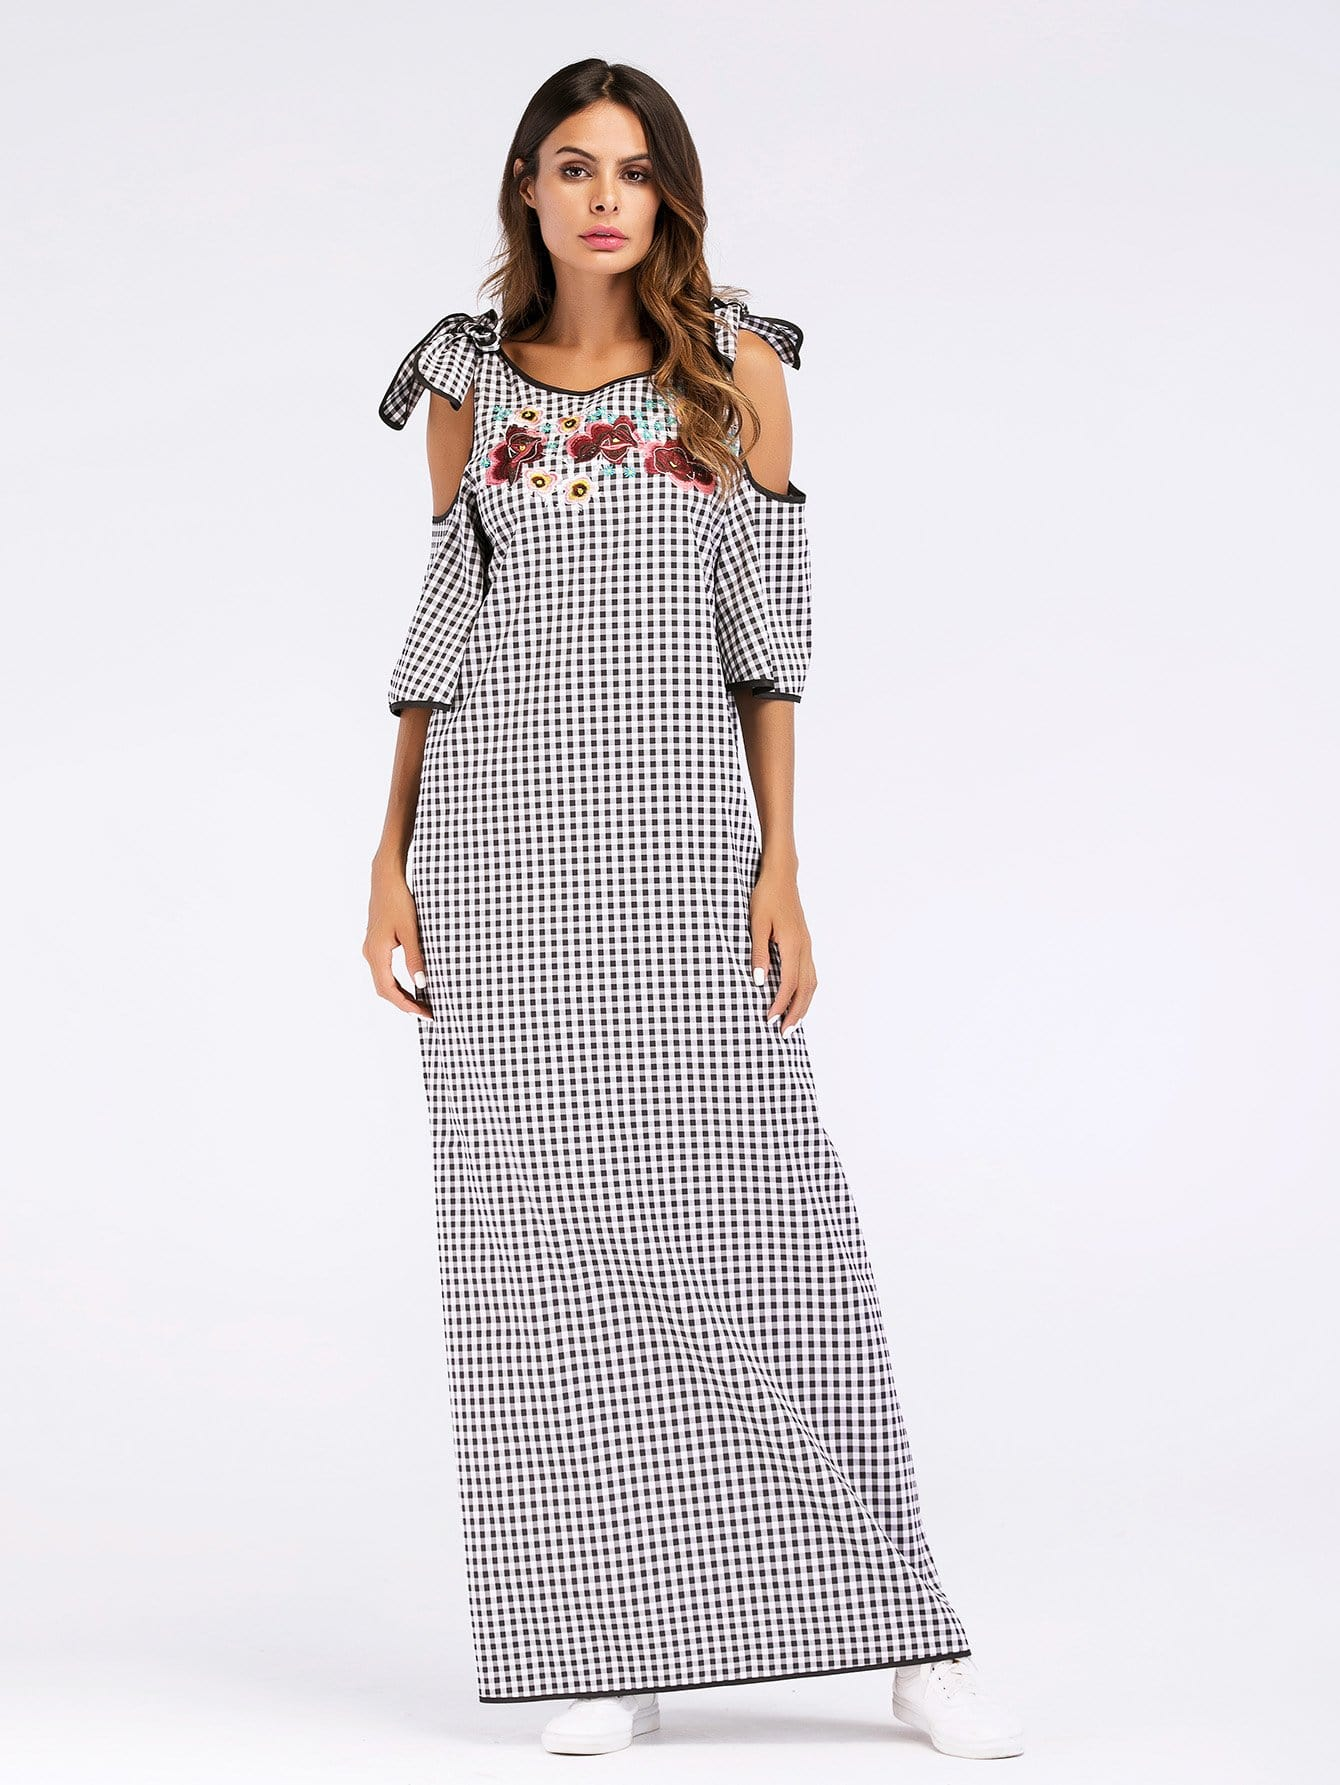 Floral Embroidered Self Tie Open Shoulder Plaid Dress open shoulder plaid top